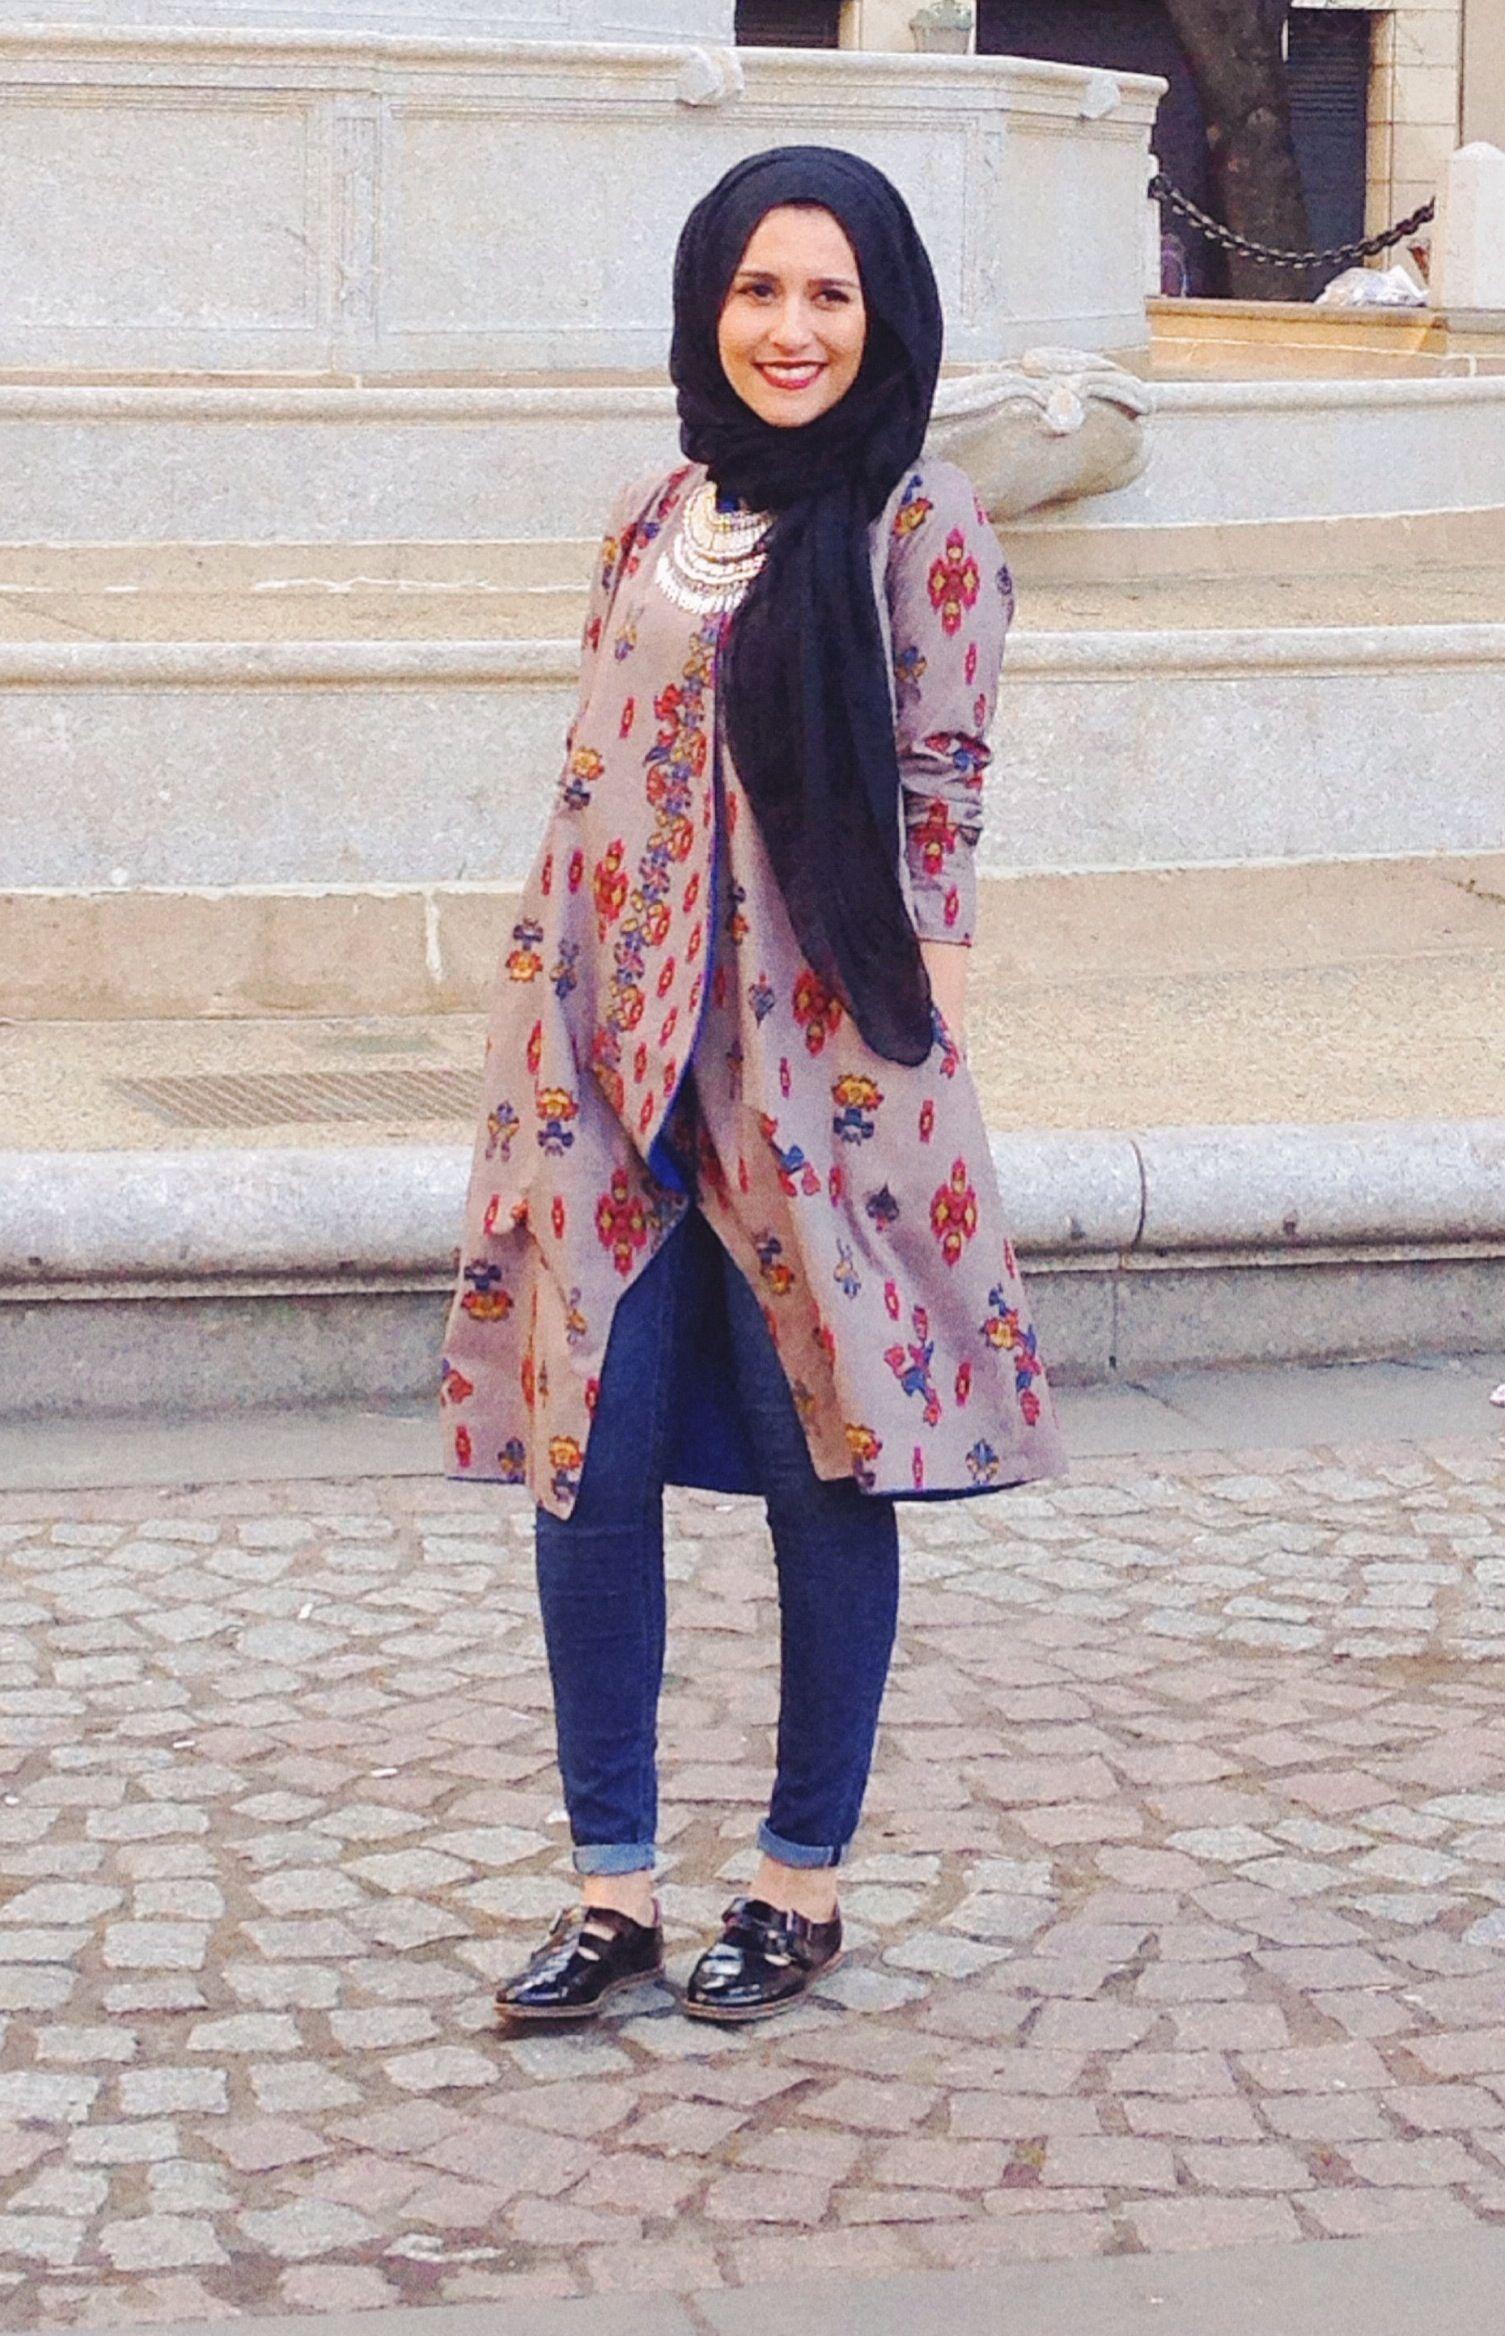 Dina Tokio Hijabi Fashion Pinterest Posts Hijabs And Outfit